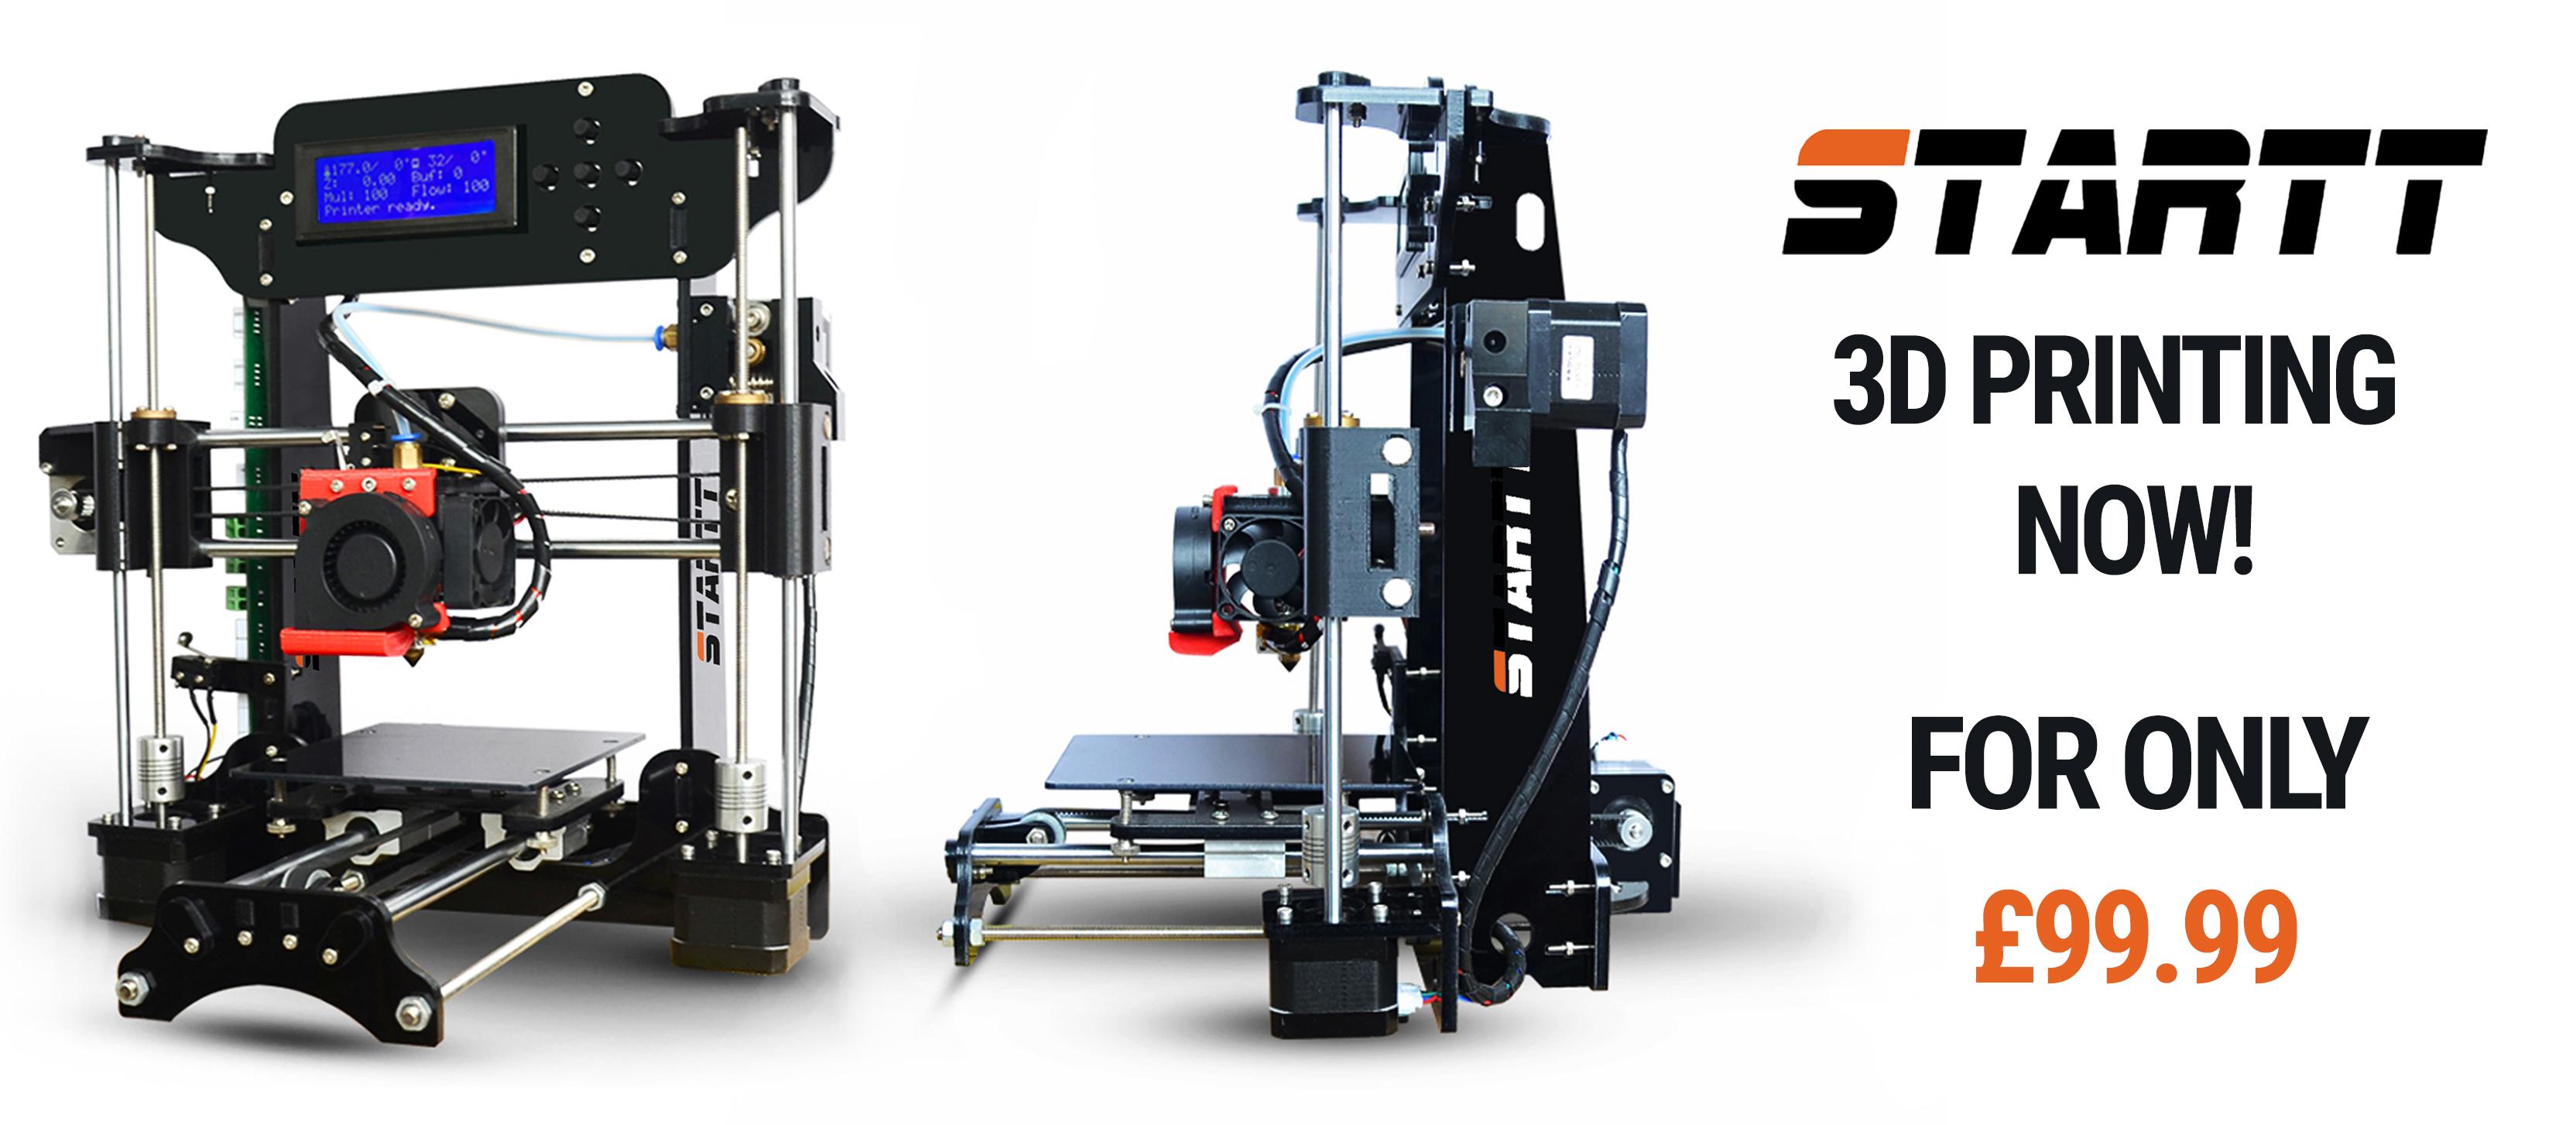 STARTT 3D Printer